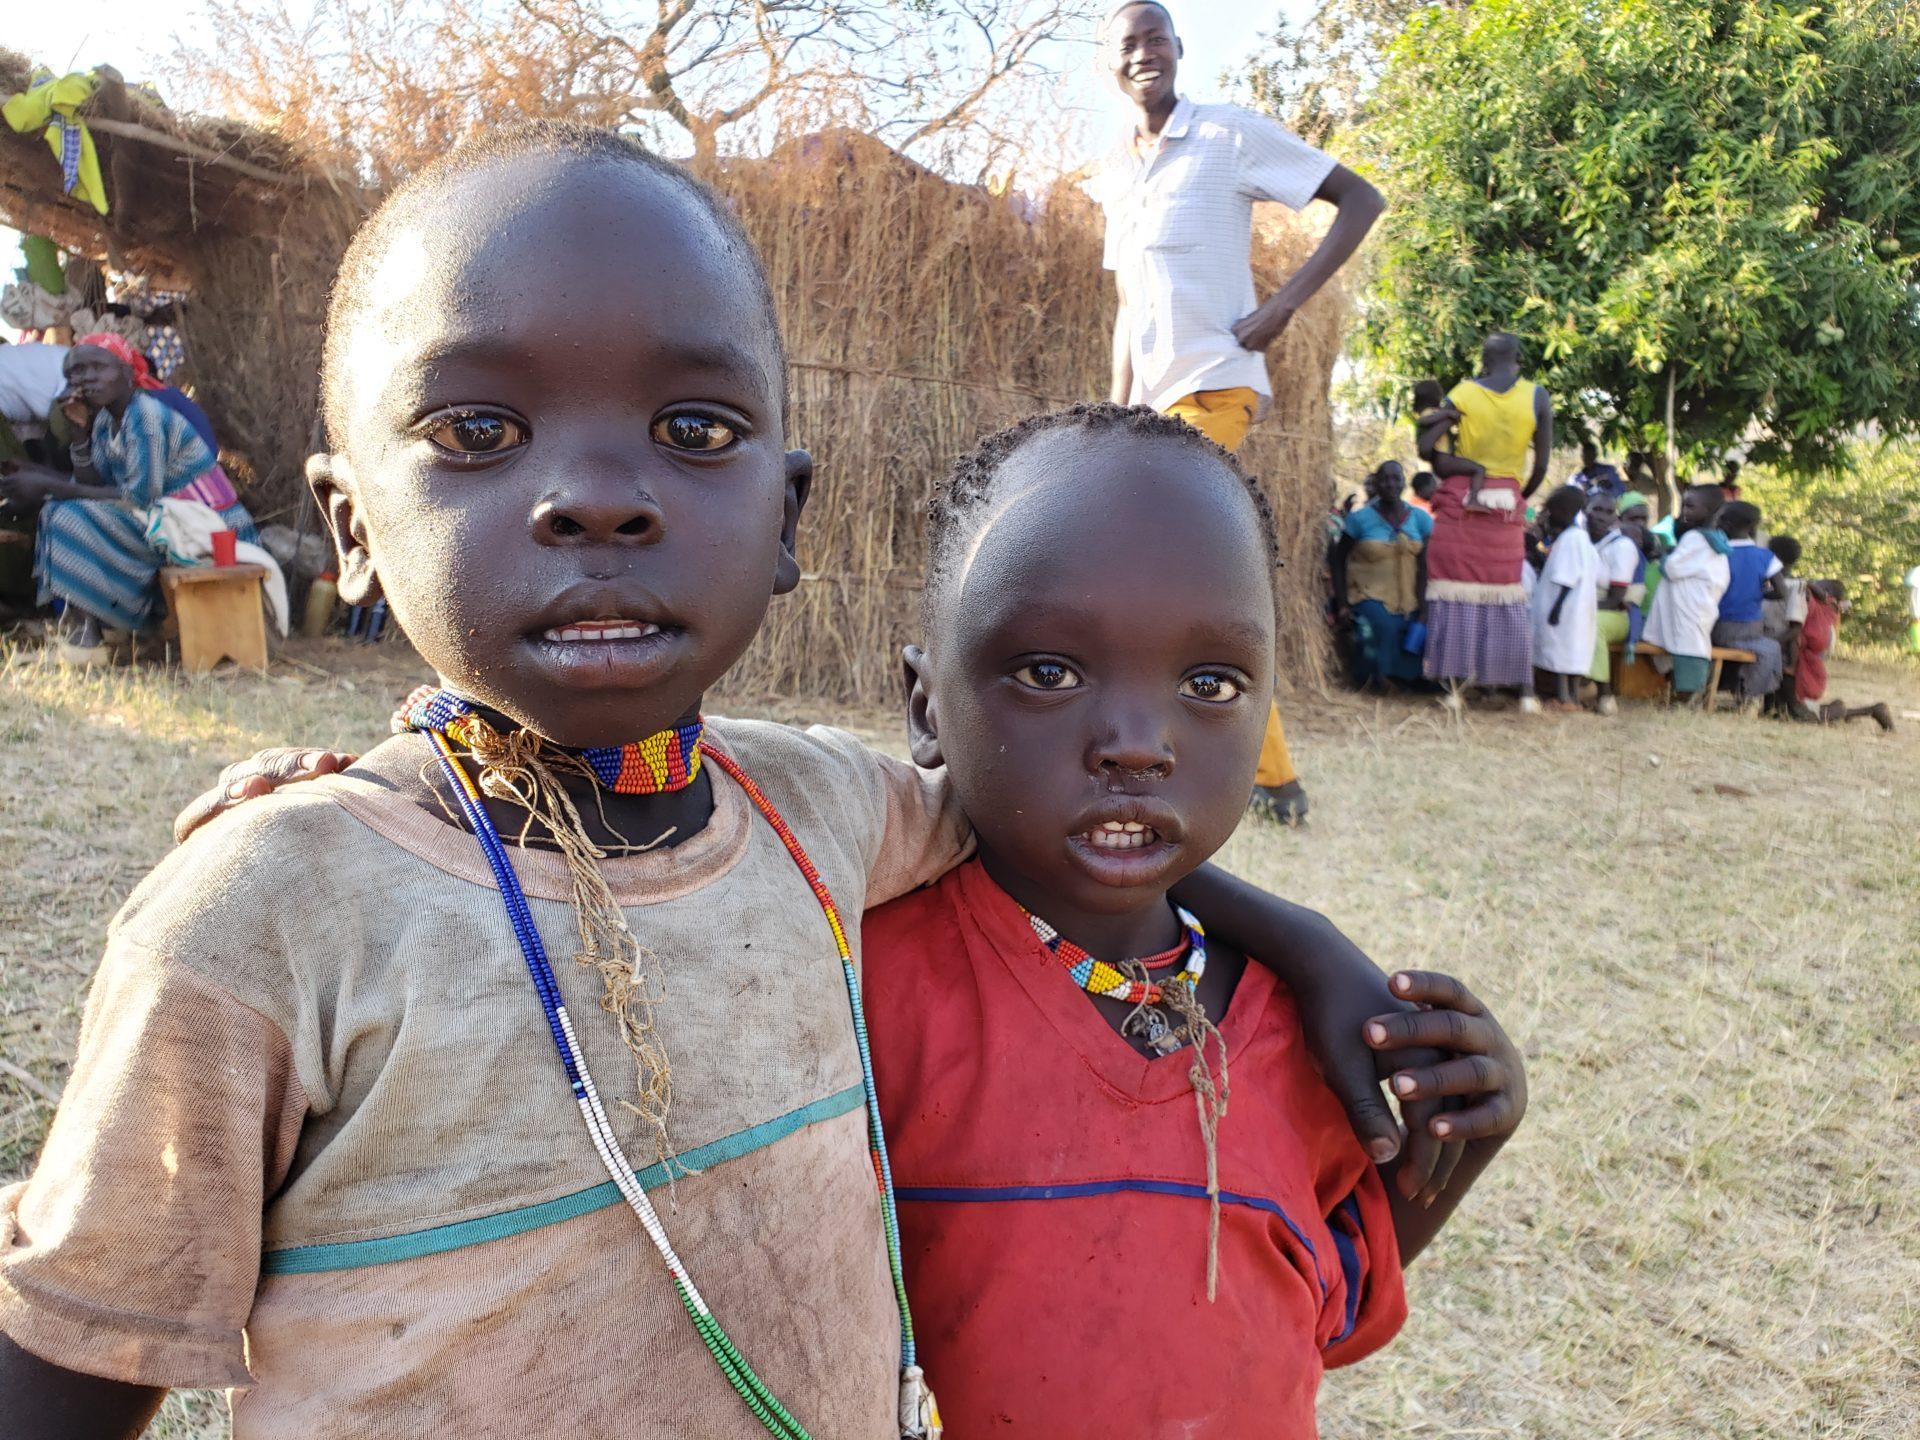 A Chance in Life – Ethiopia, Caritas Pro Vitae Gradu Charitable Trust, Ariane Slinger